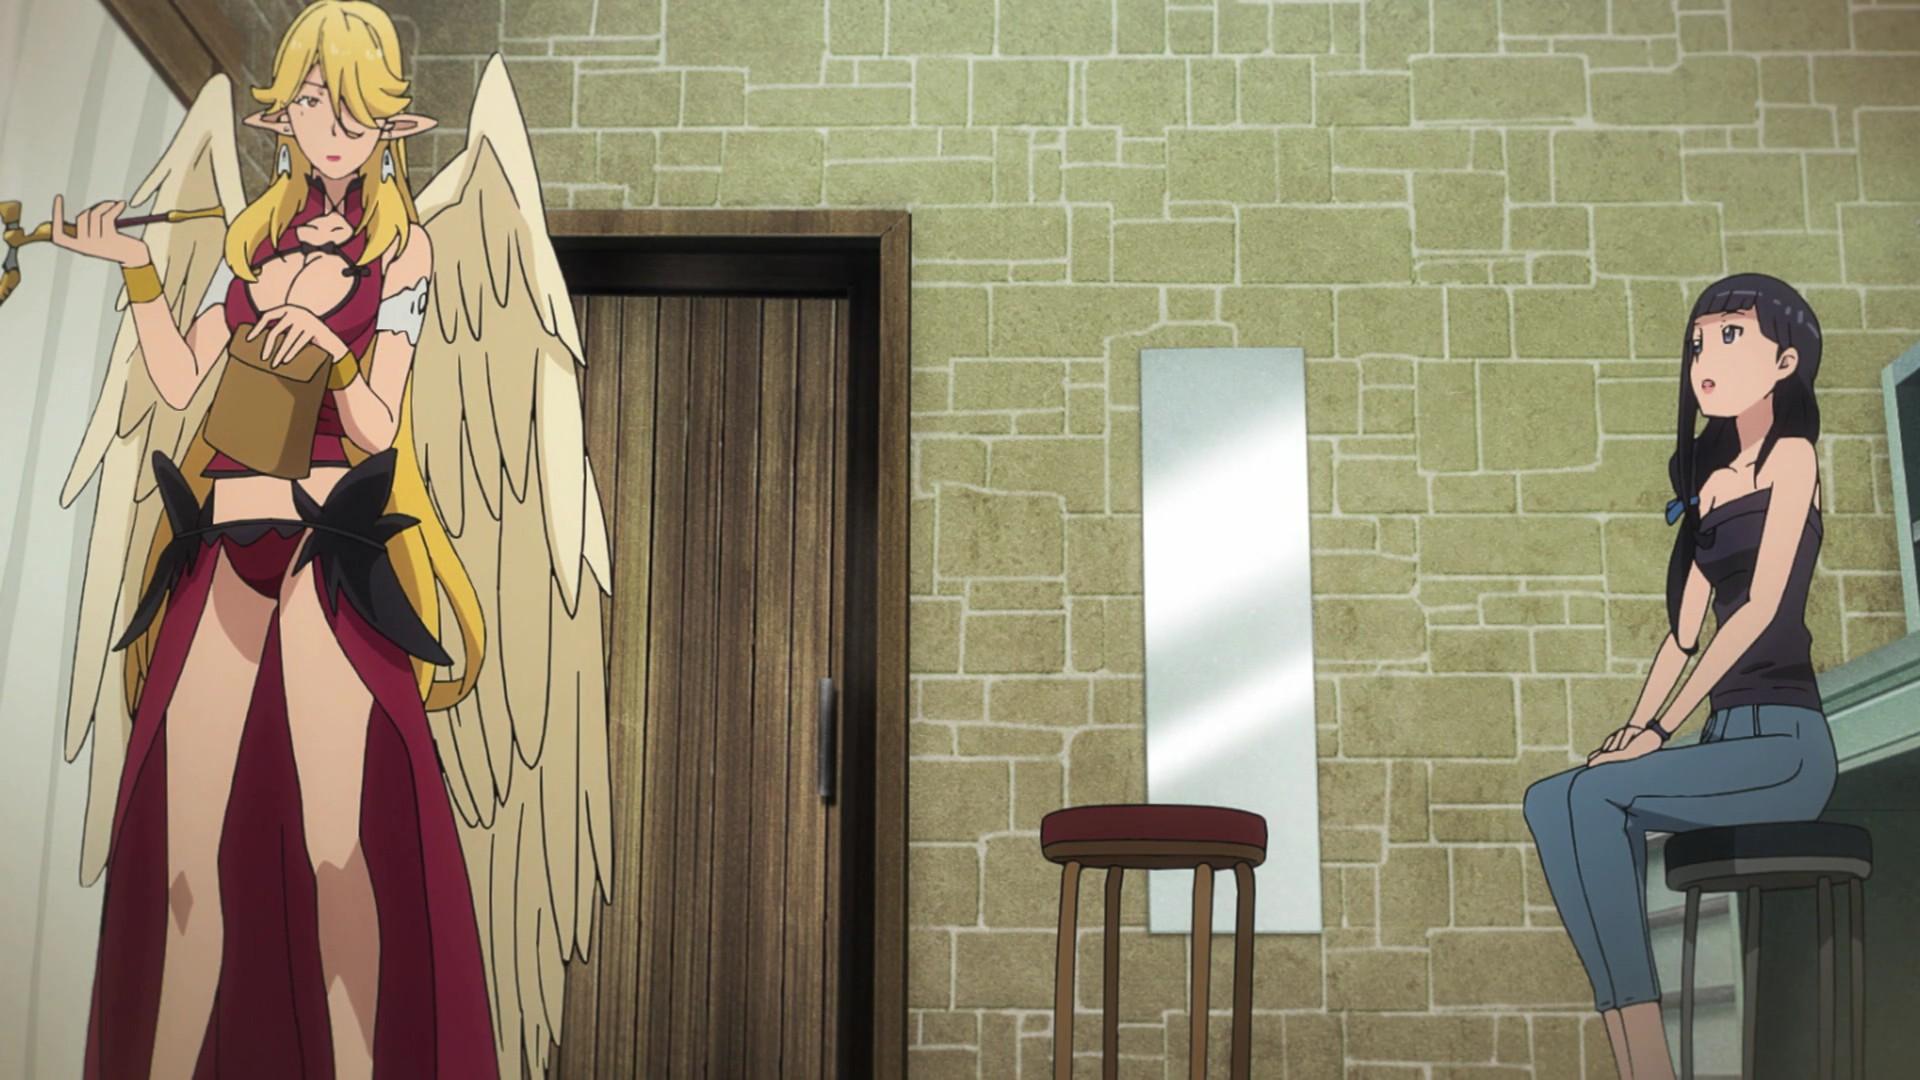 【GATE】黒川茉莉は二等陸曹可愛い【自衛隊】 [転載禁止]©2ch.netYouTube動画>4本 ->画像>57枚